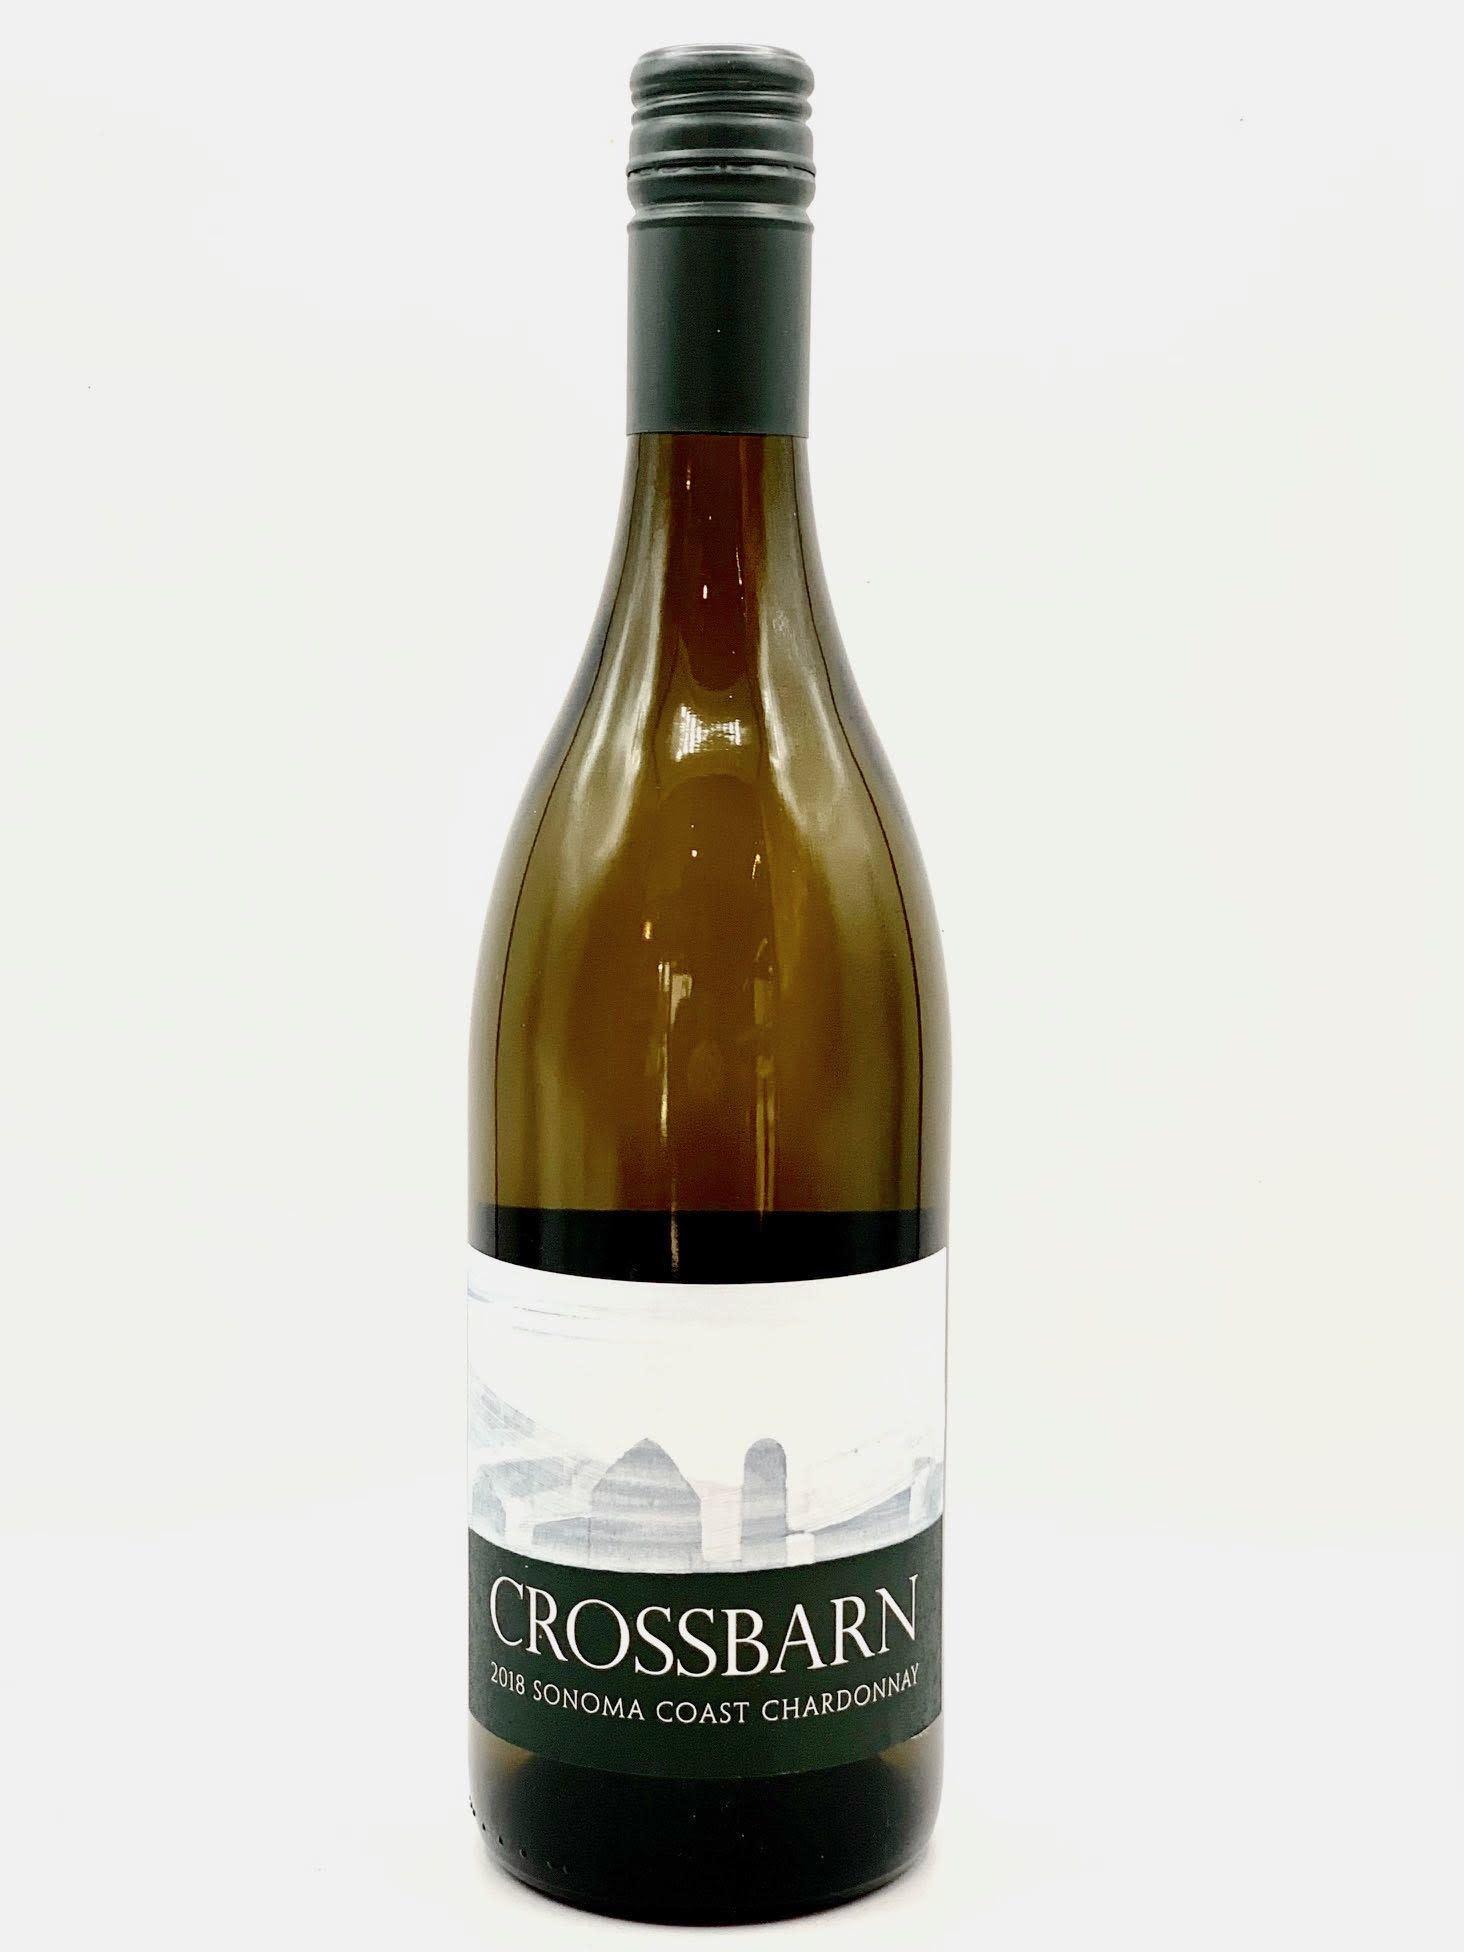 Sonoma Coast Chardonnay 2018 Crossbarn by Paul Hobbs  750ml